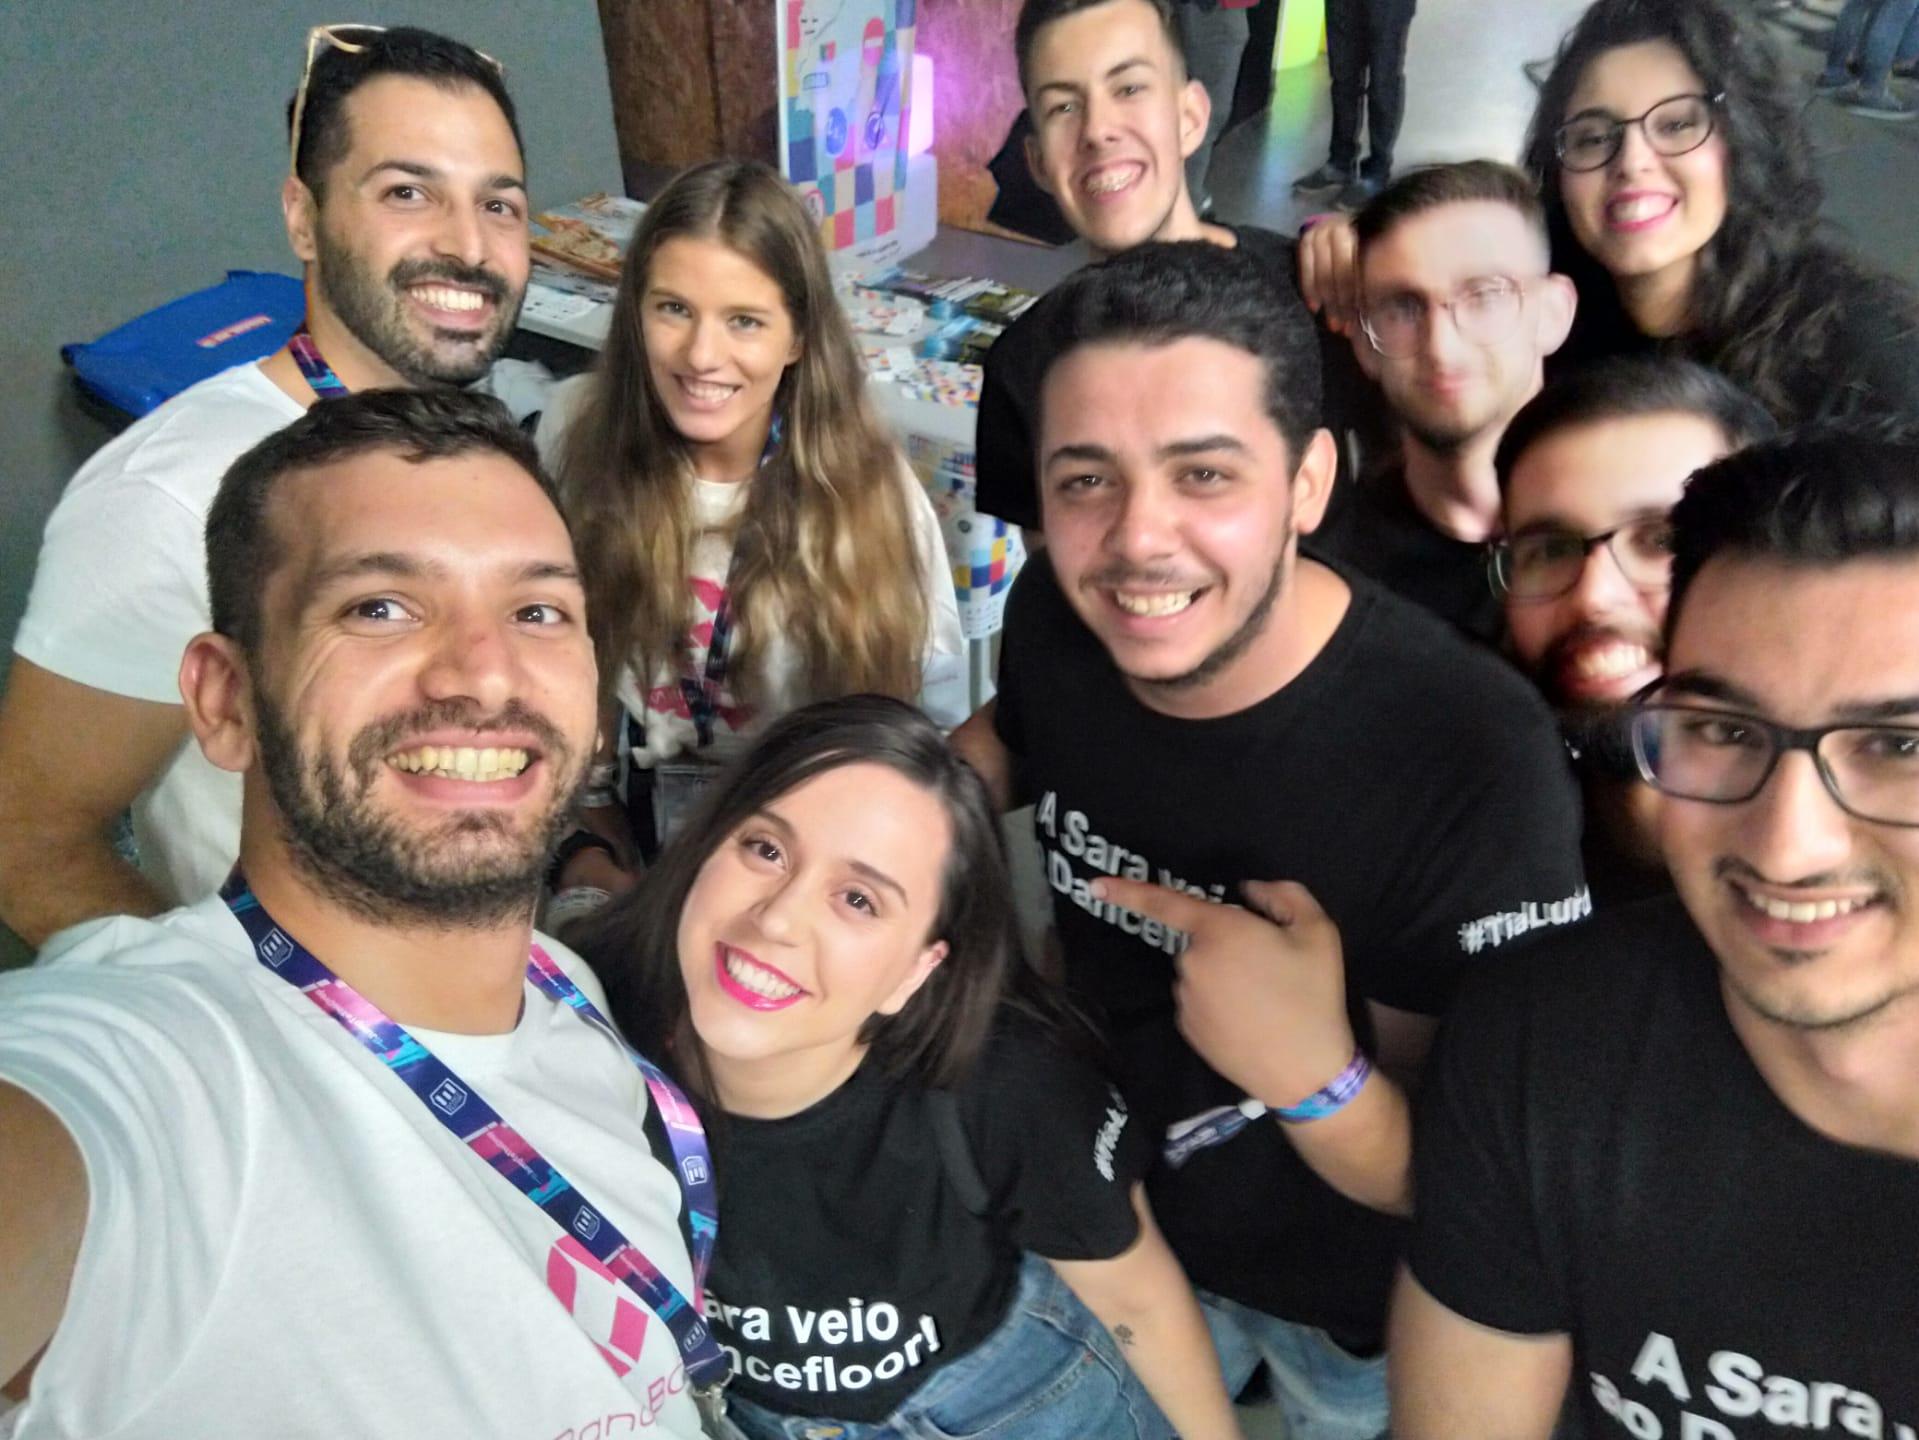 Action au Dancefloor Braga 2019, les 26 et 27 juillet 2019